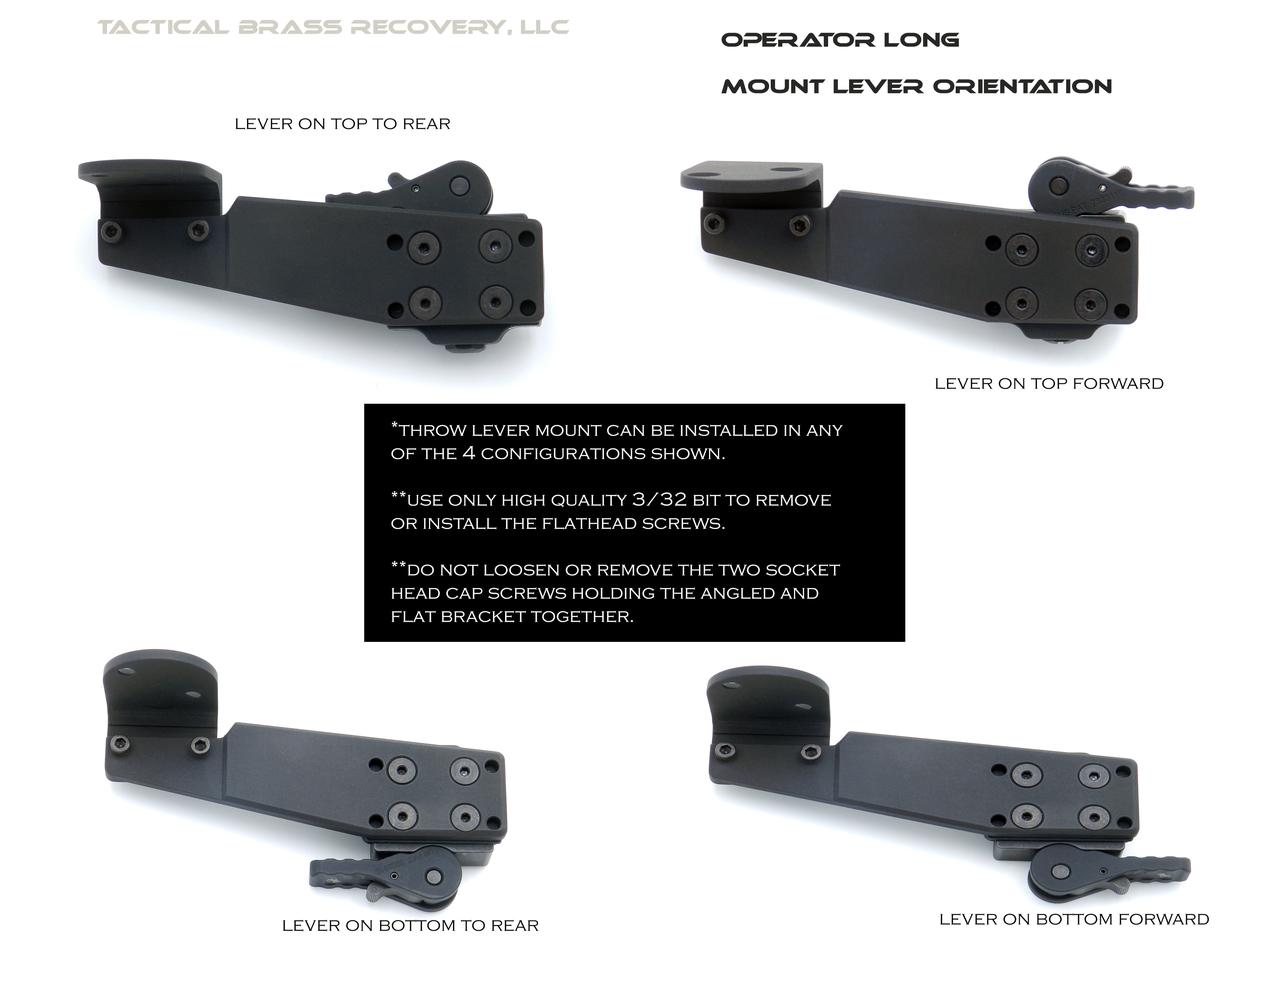 OPERATOR SCAR 20S / FN PR / MK20 brass catcher